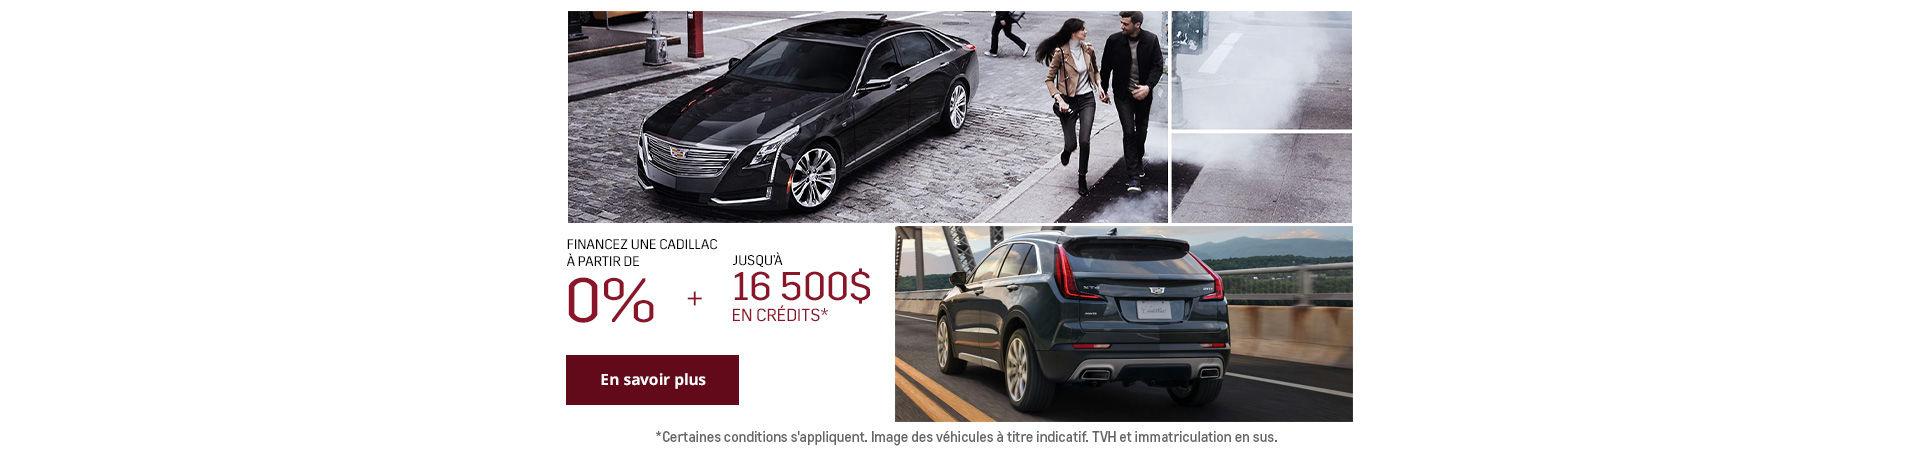 L'événement mensuel Cadillac